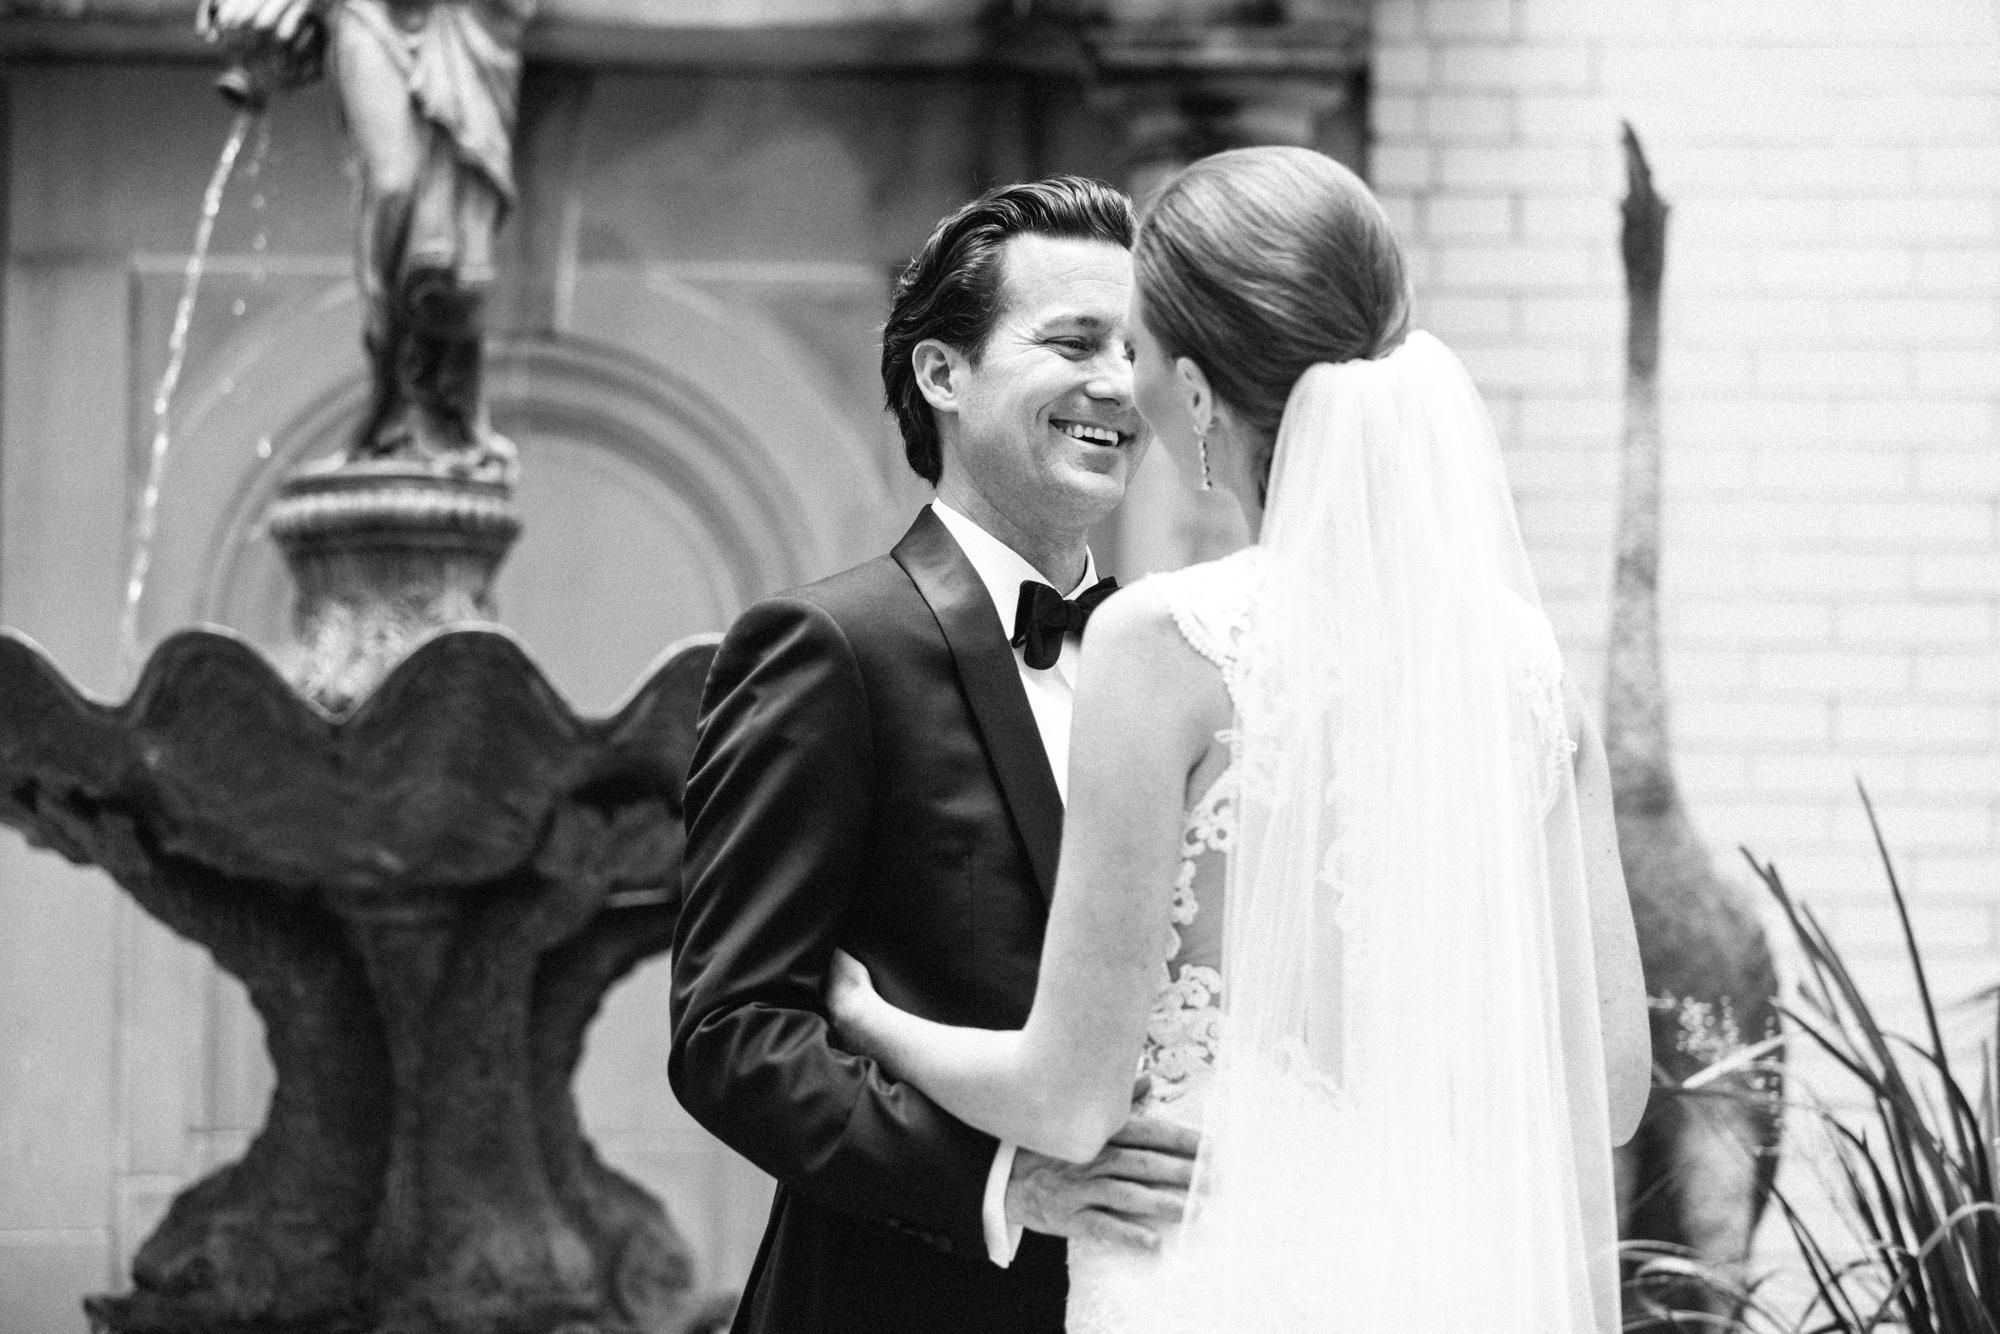 New_Orleans_Wedding_Photographer_1106.jpg